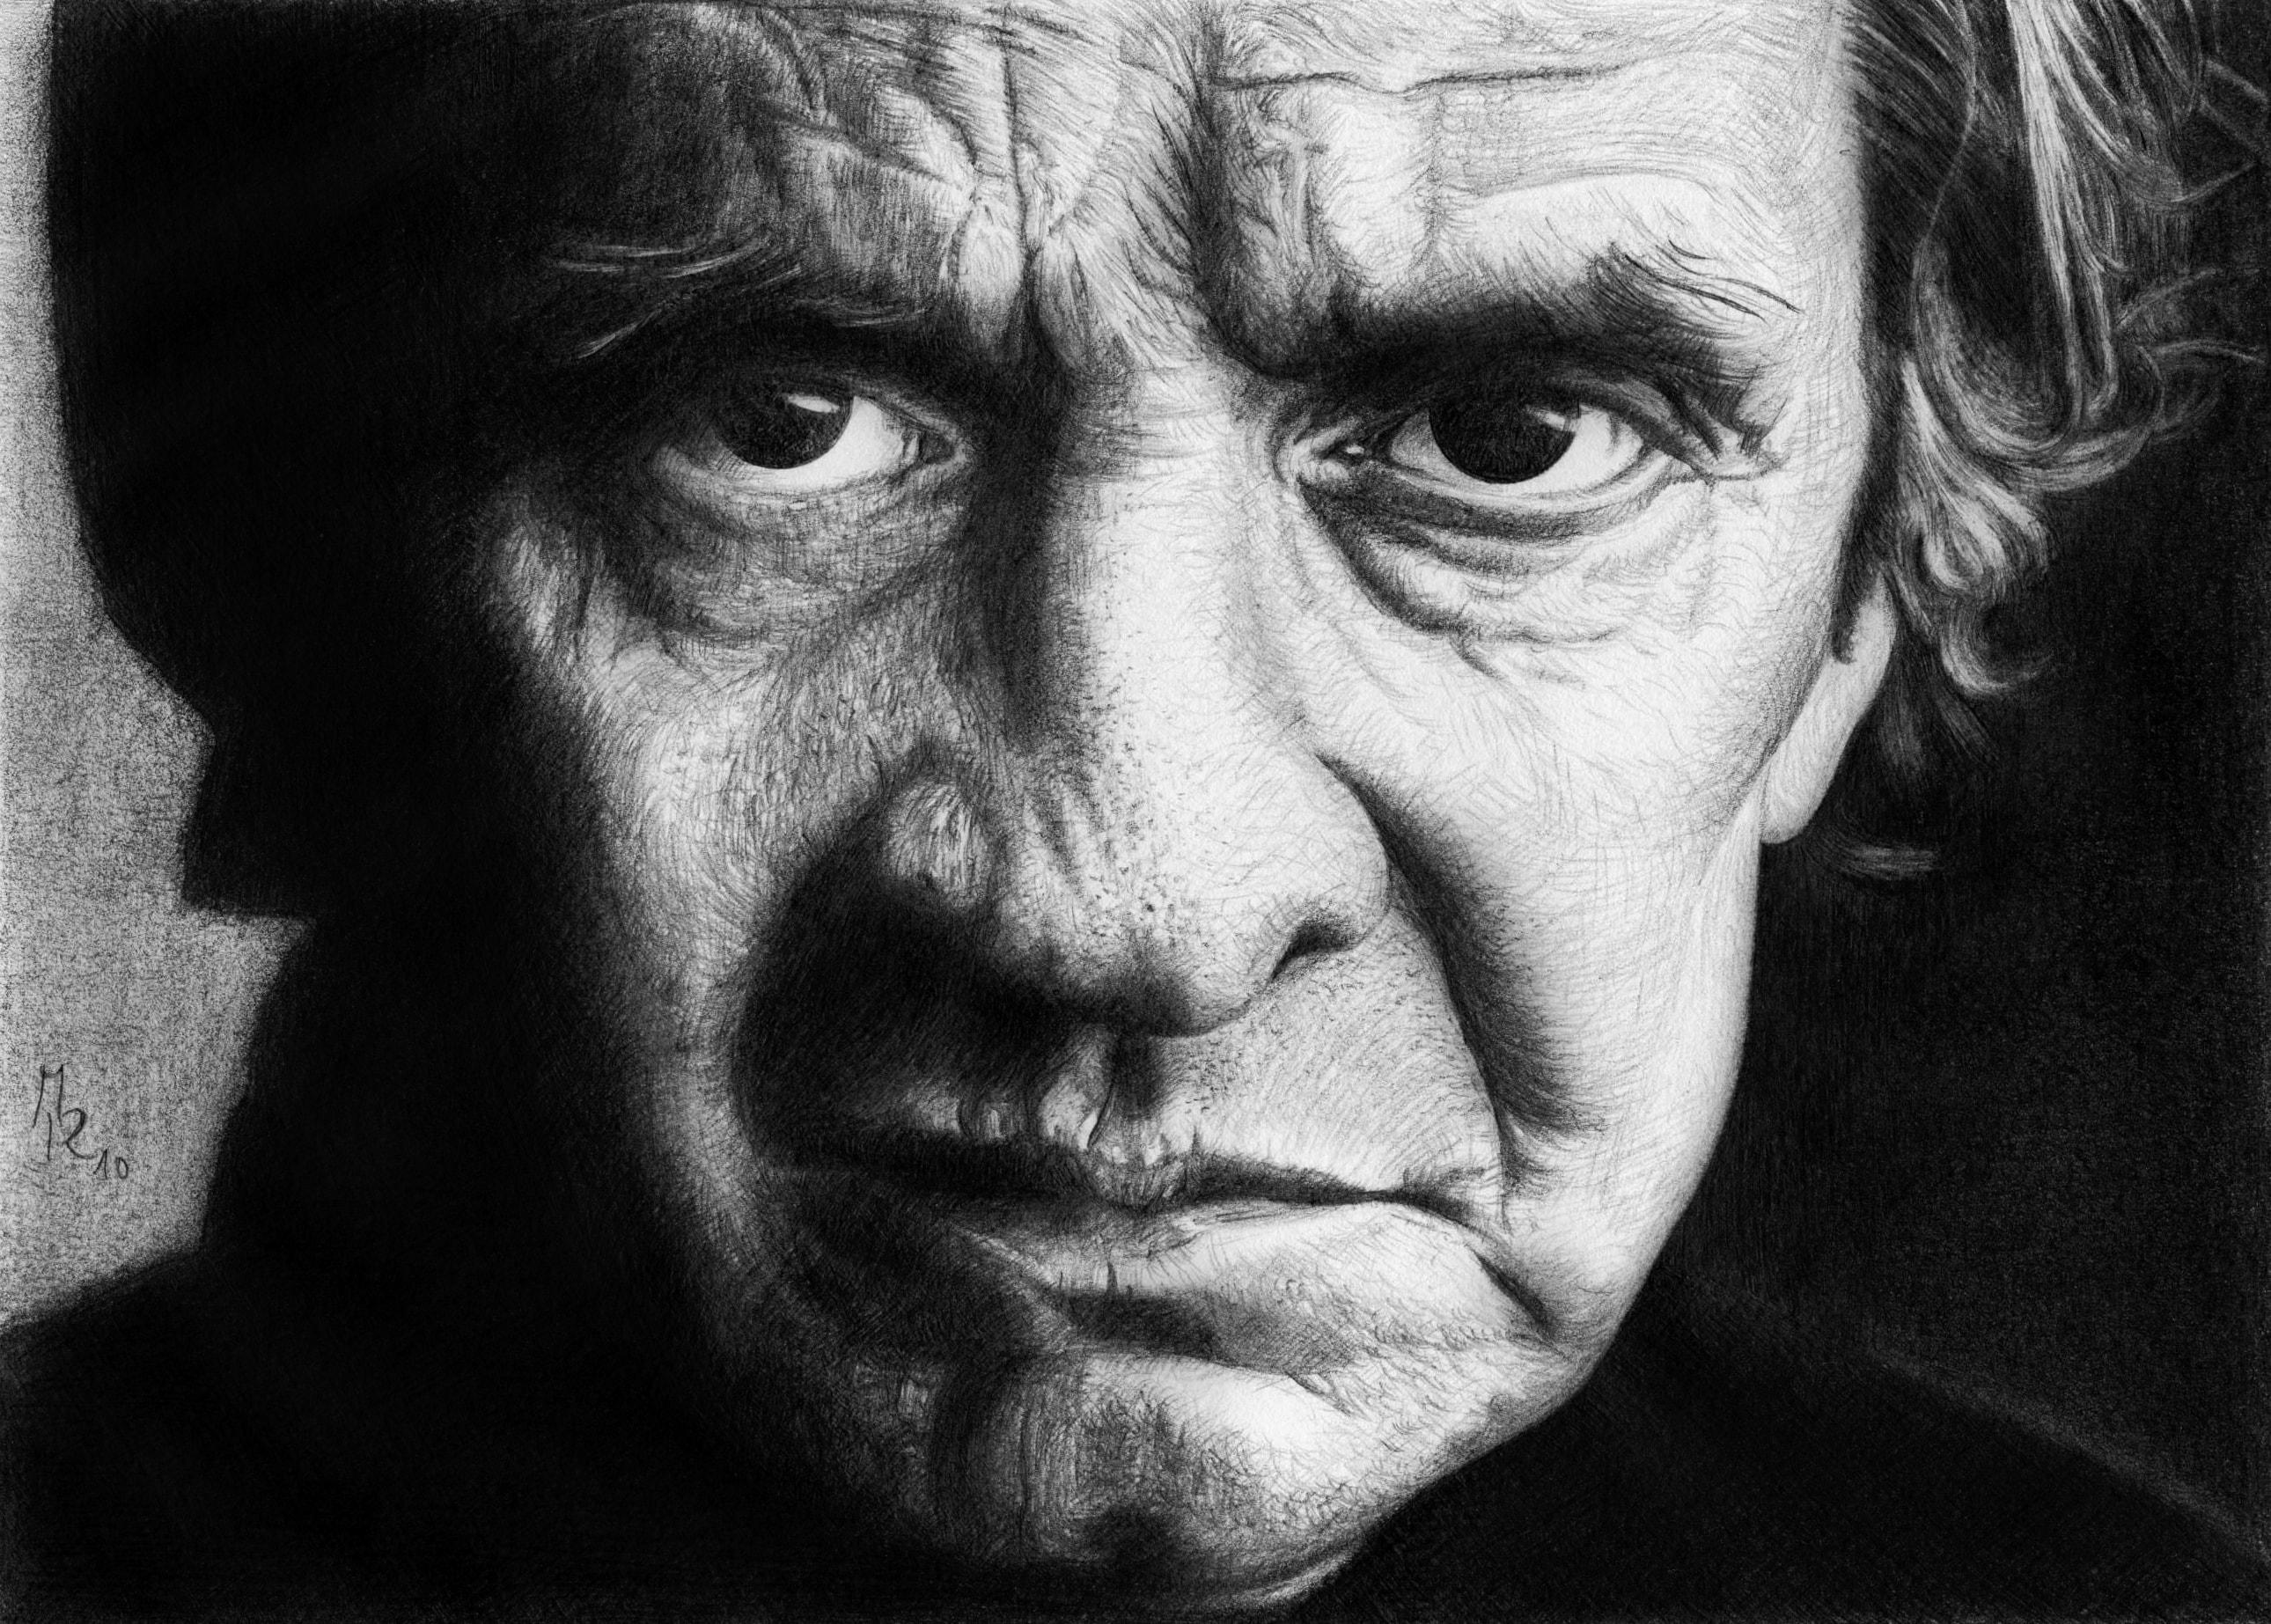 Johnny Cash Backgrounds